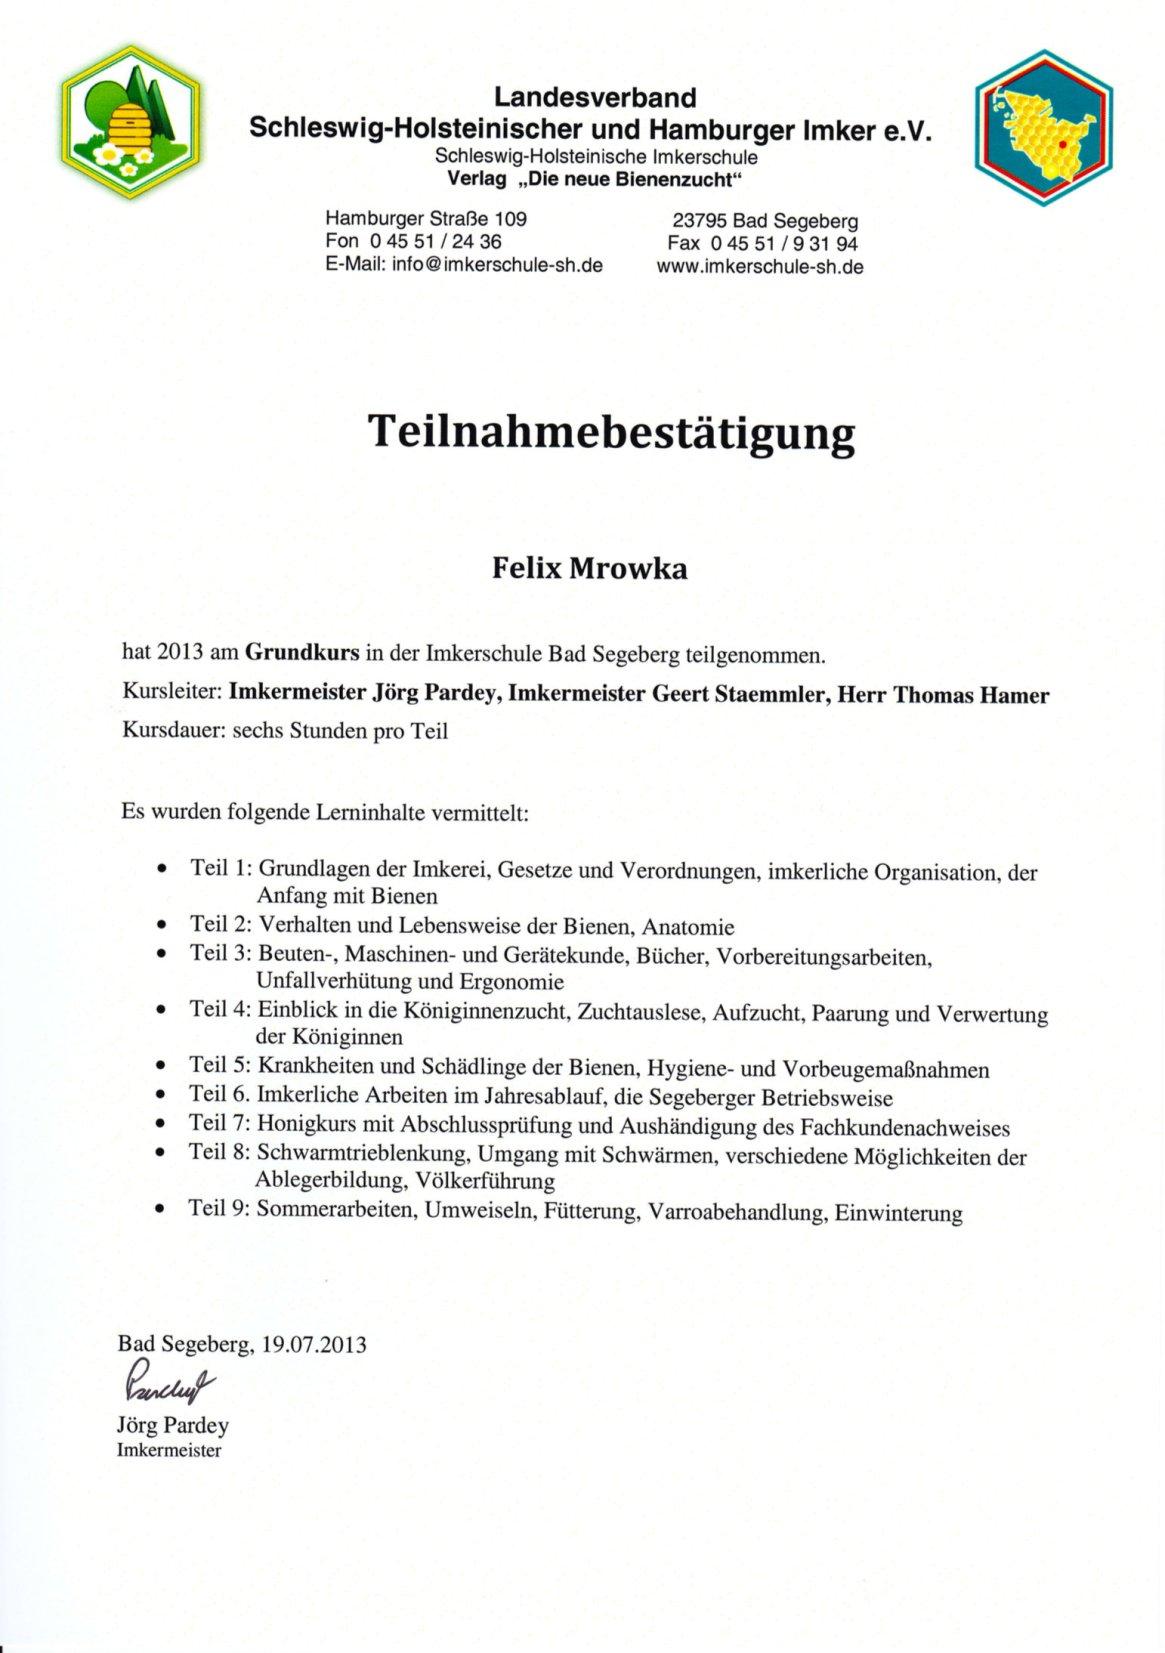 Teilnahmebestätigung Grundkurs Imkerschule Segeberg Felix Mrowka